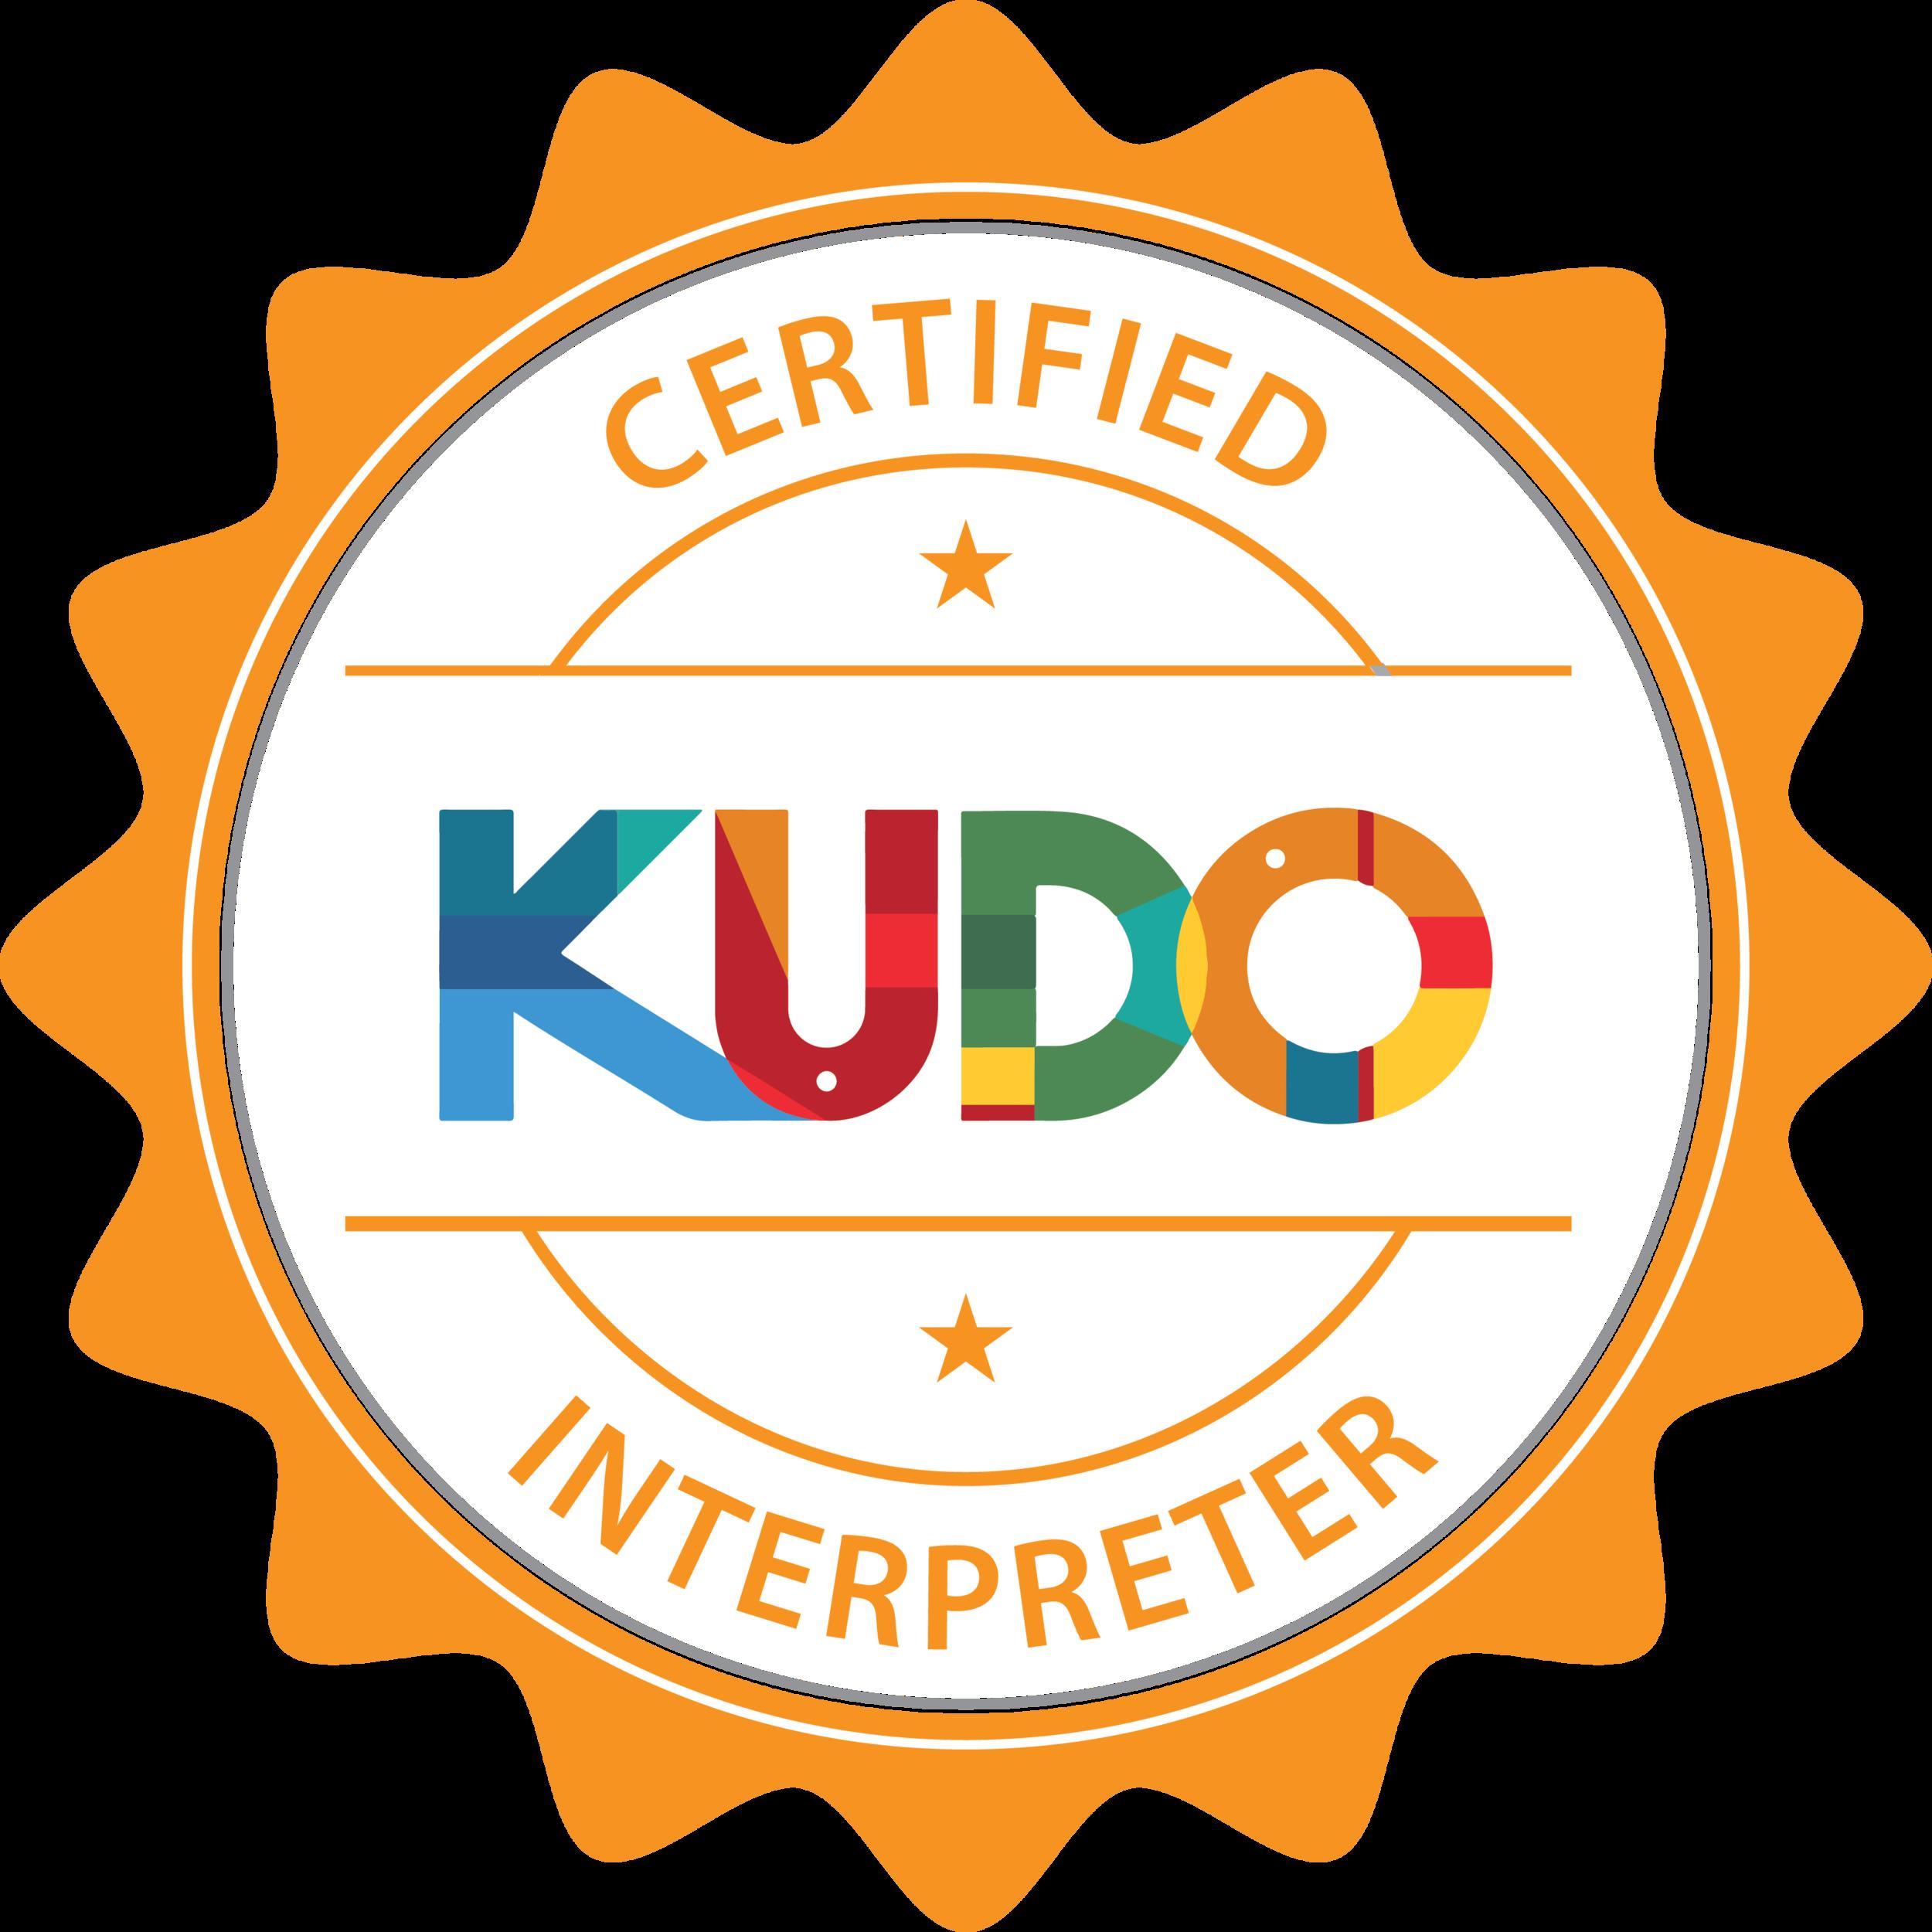 KUDO is a powerful cloud-based multilingual collaboration platform.  KUDOは強力なクラウドベースの多言語コラボレーション・プラットフォーム。